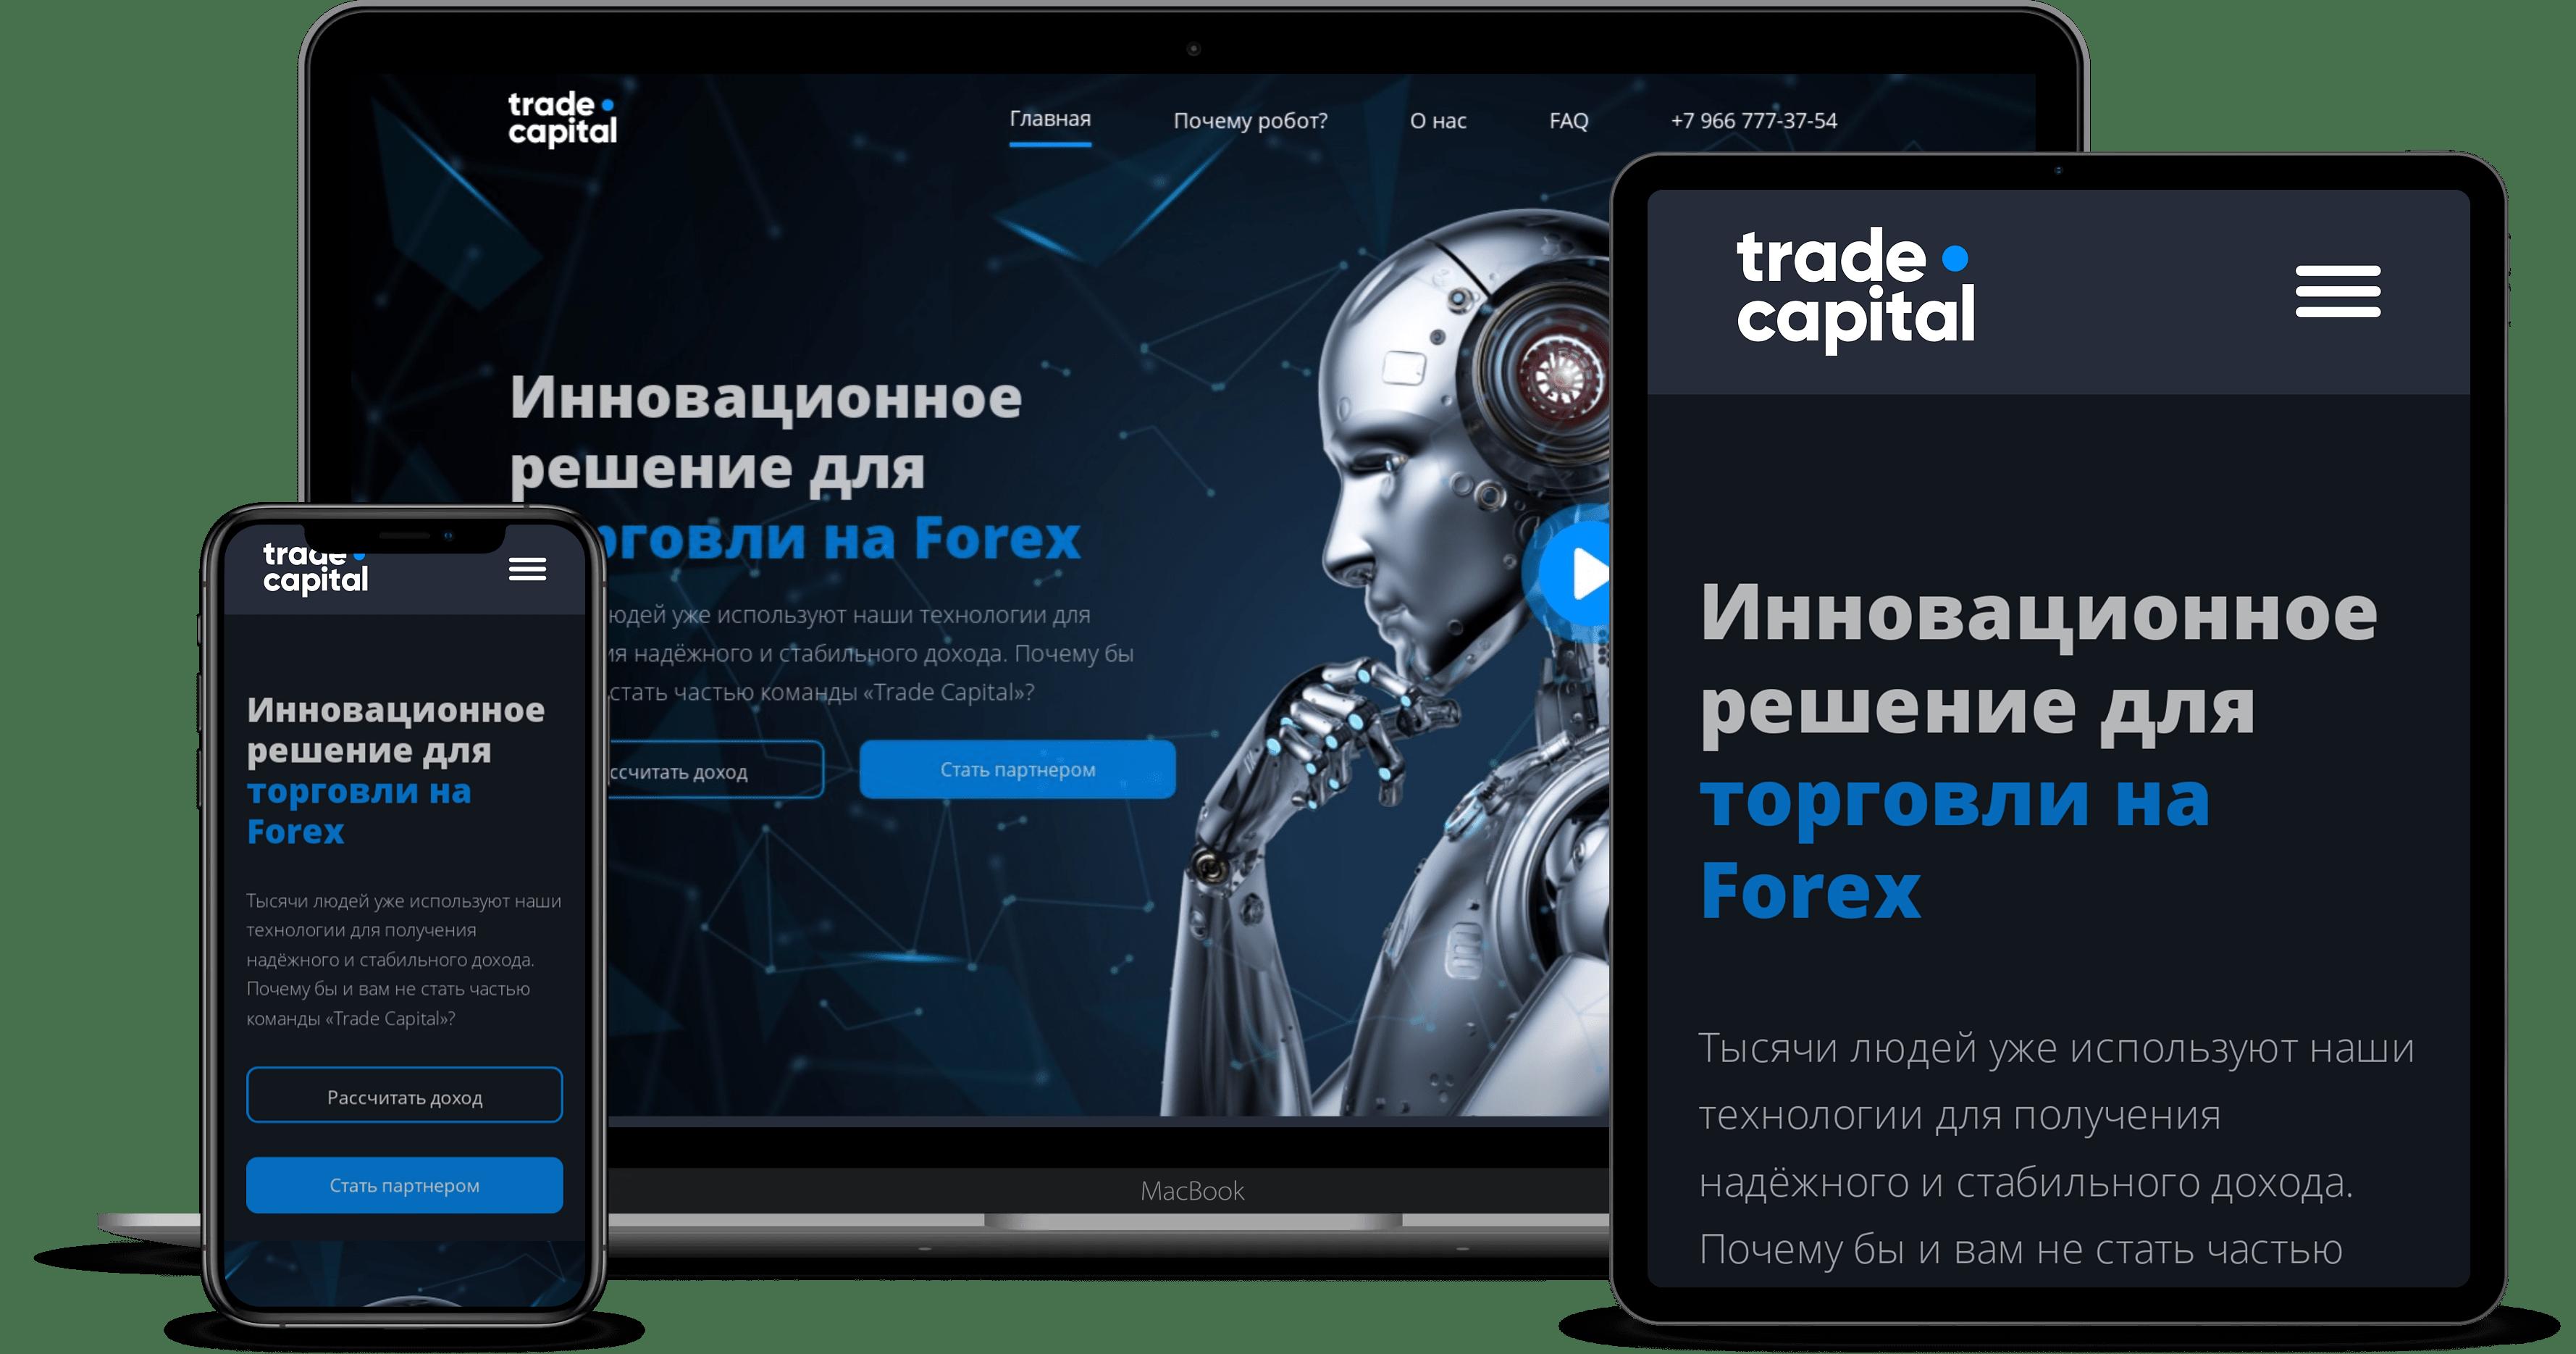 Trade Capital промо сайт